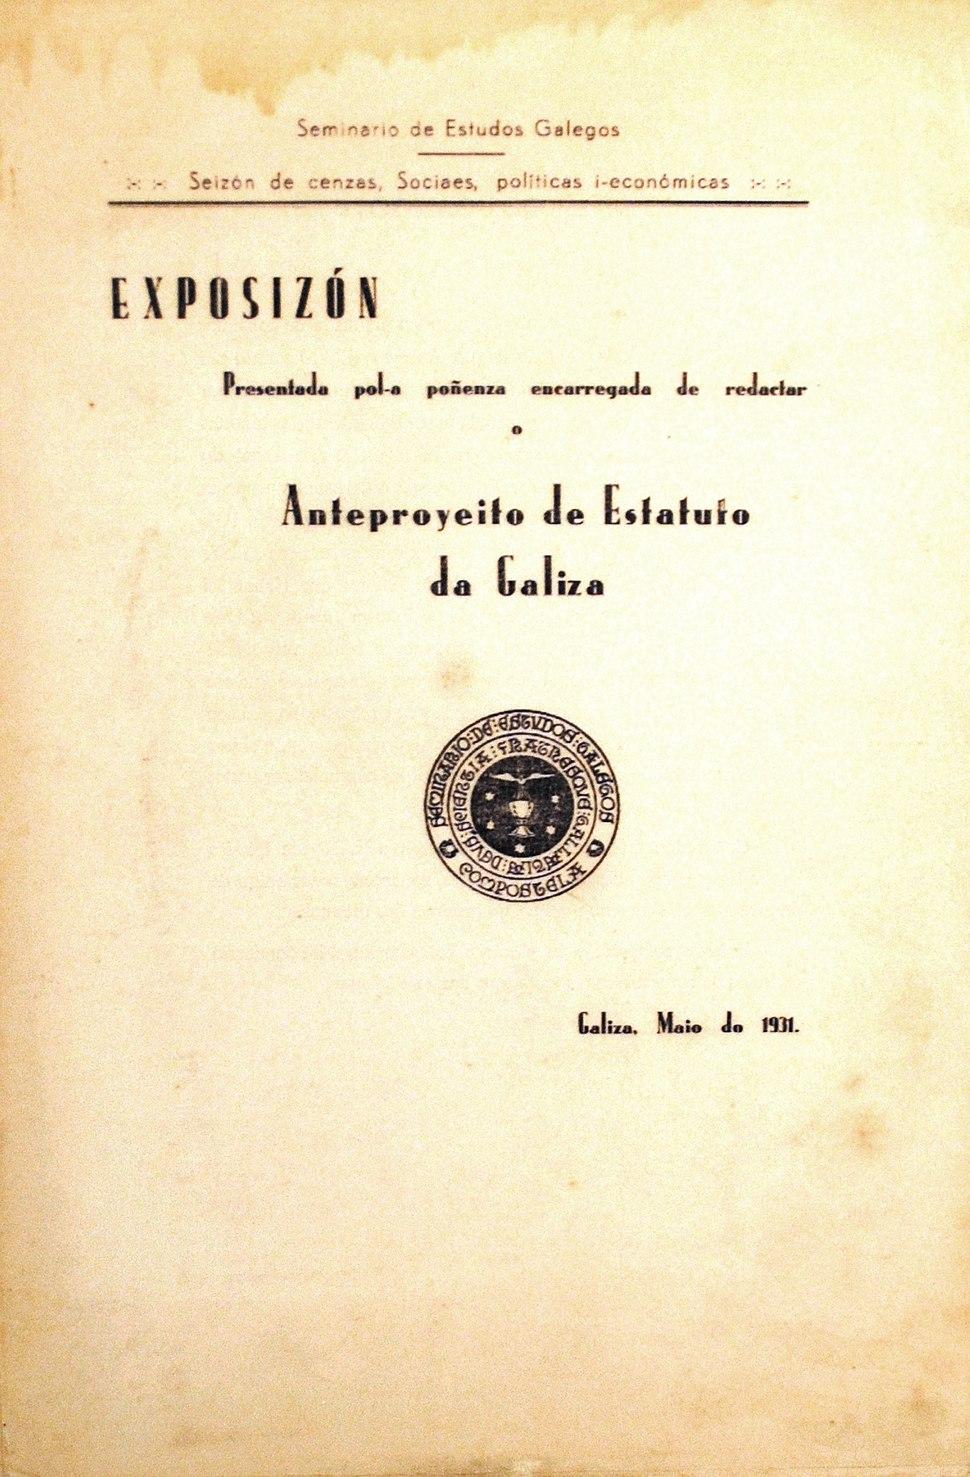 Anteproyeito de Estatuto da Galiza